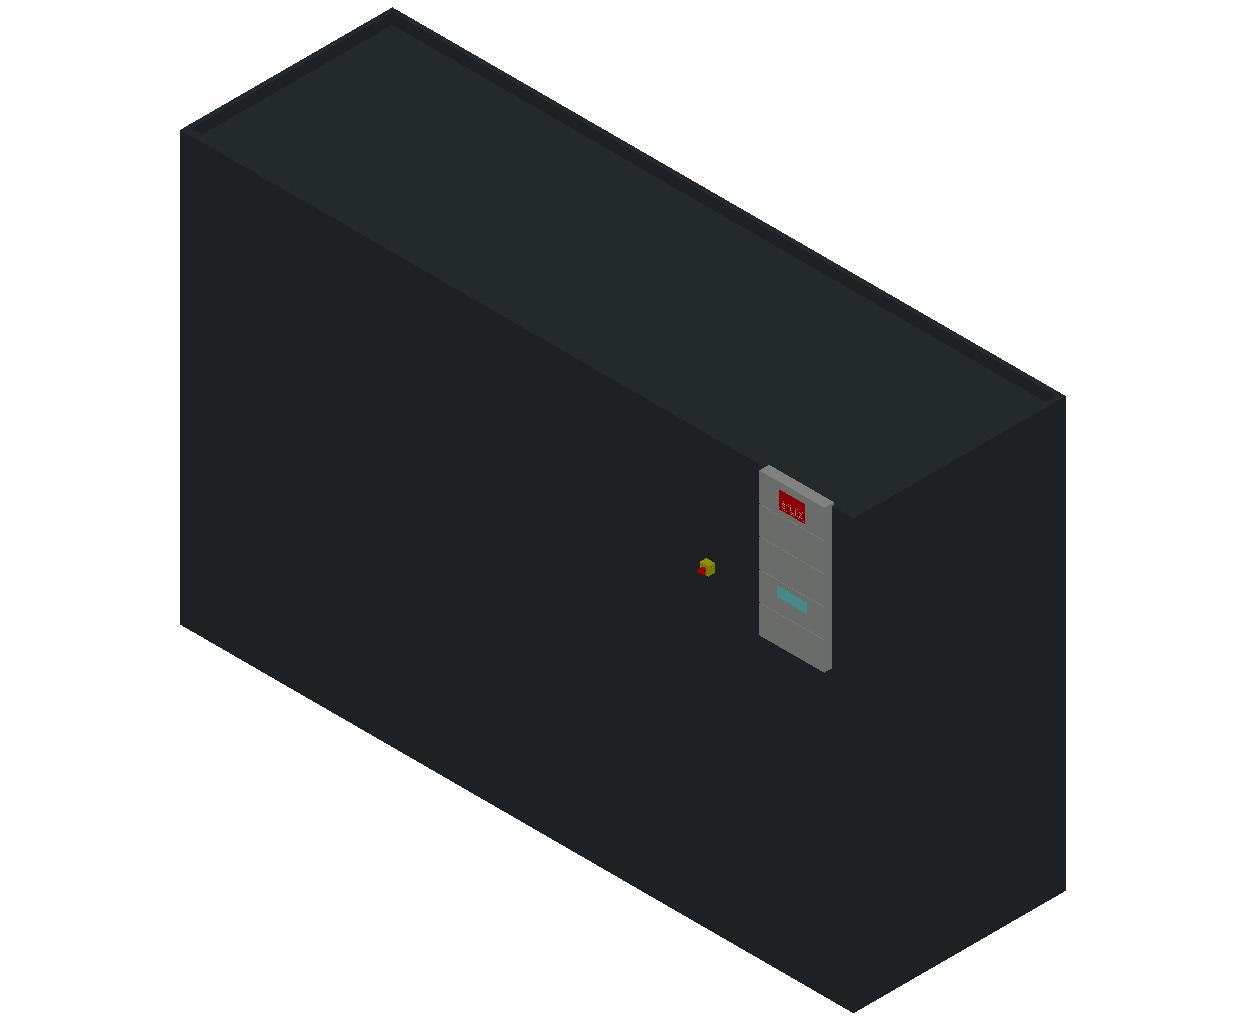 HC_Air Conditioner_Indoor Unit_MEPcontent_STULZ_CyberAir 3PRO_ALD_Dual Circuit GES_ALD_932_GES_INT-EN.dwg